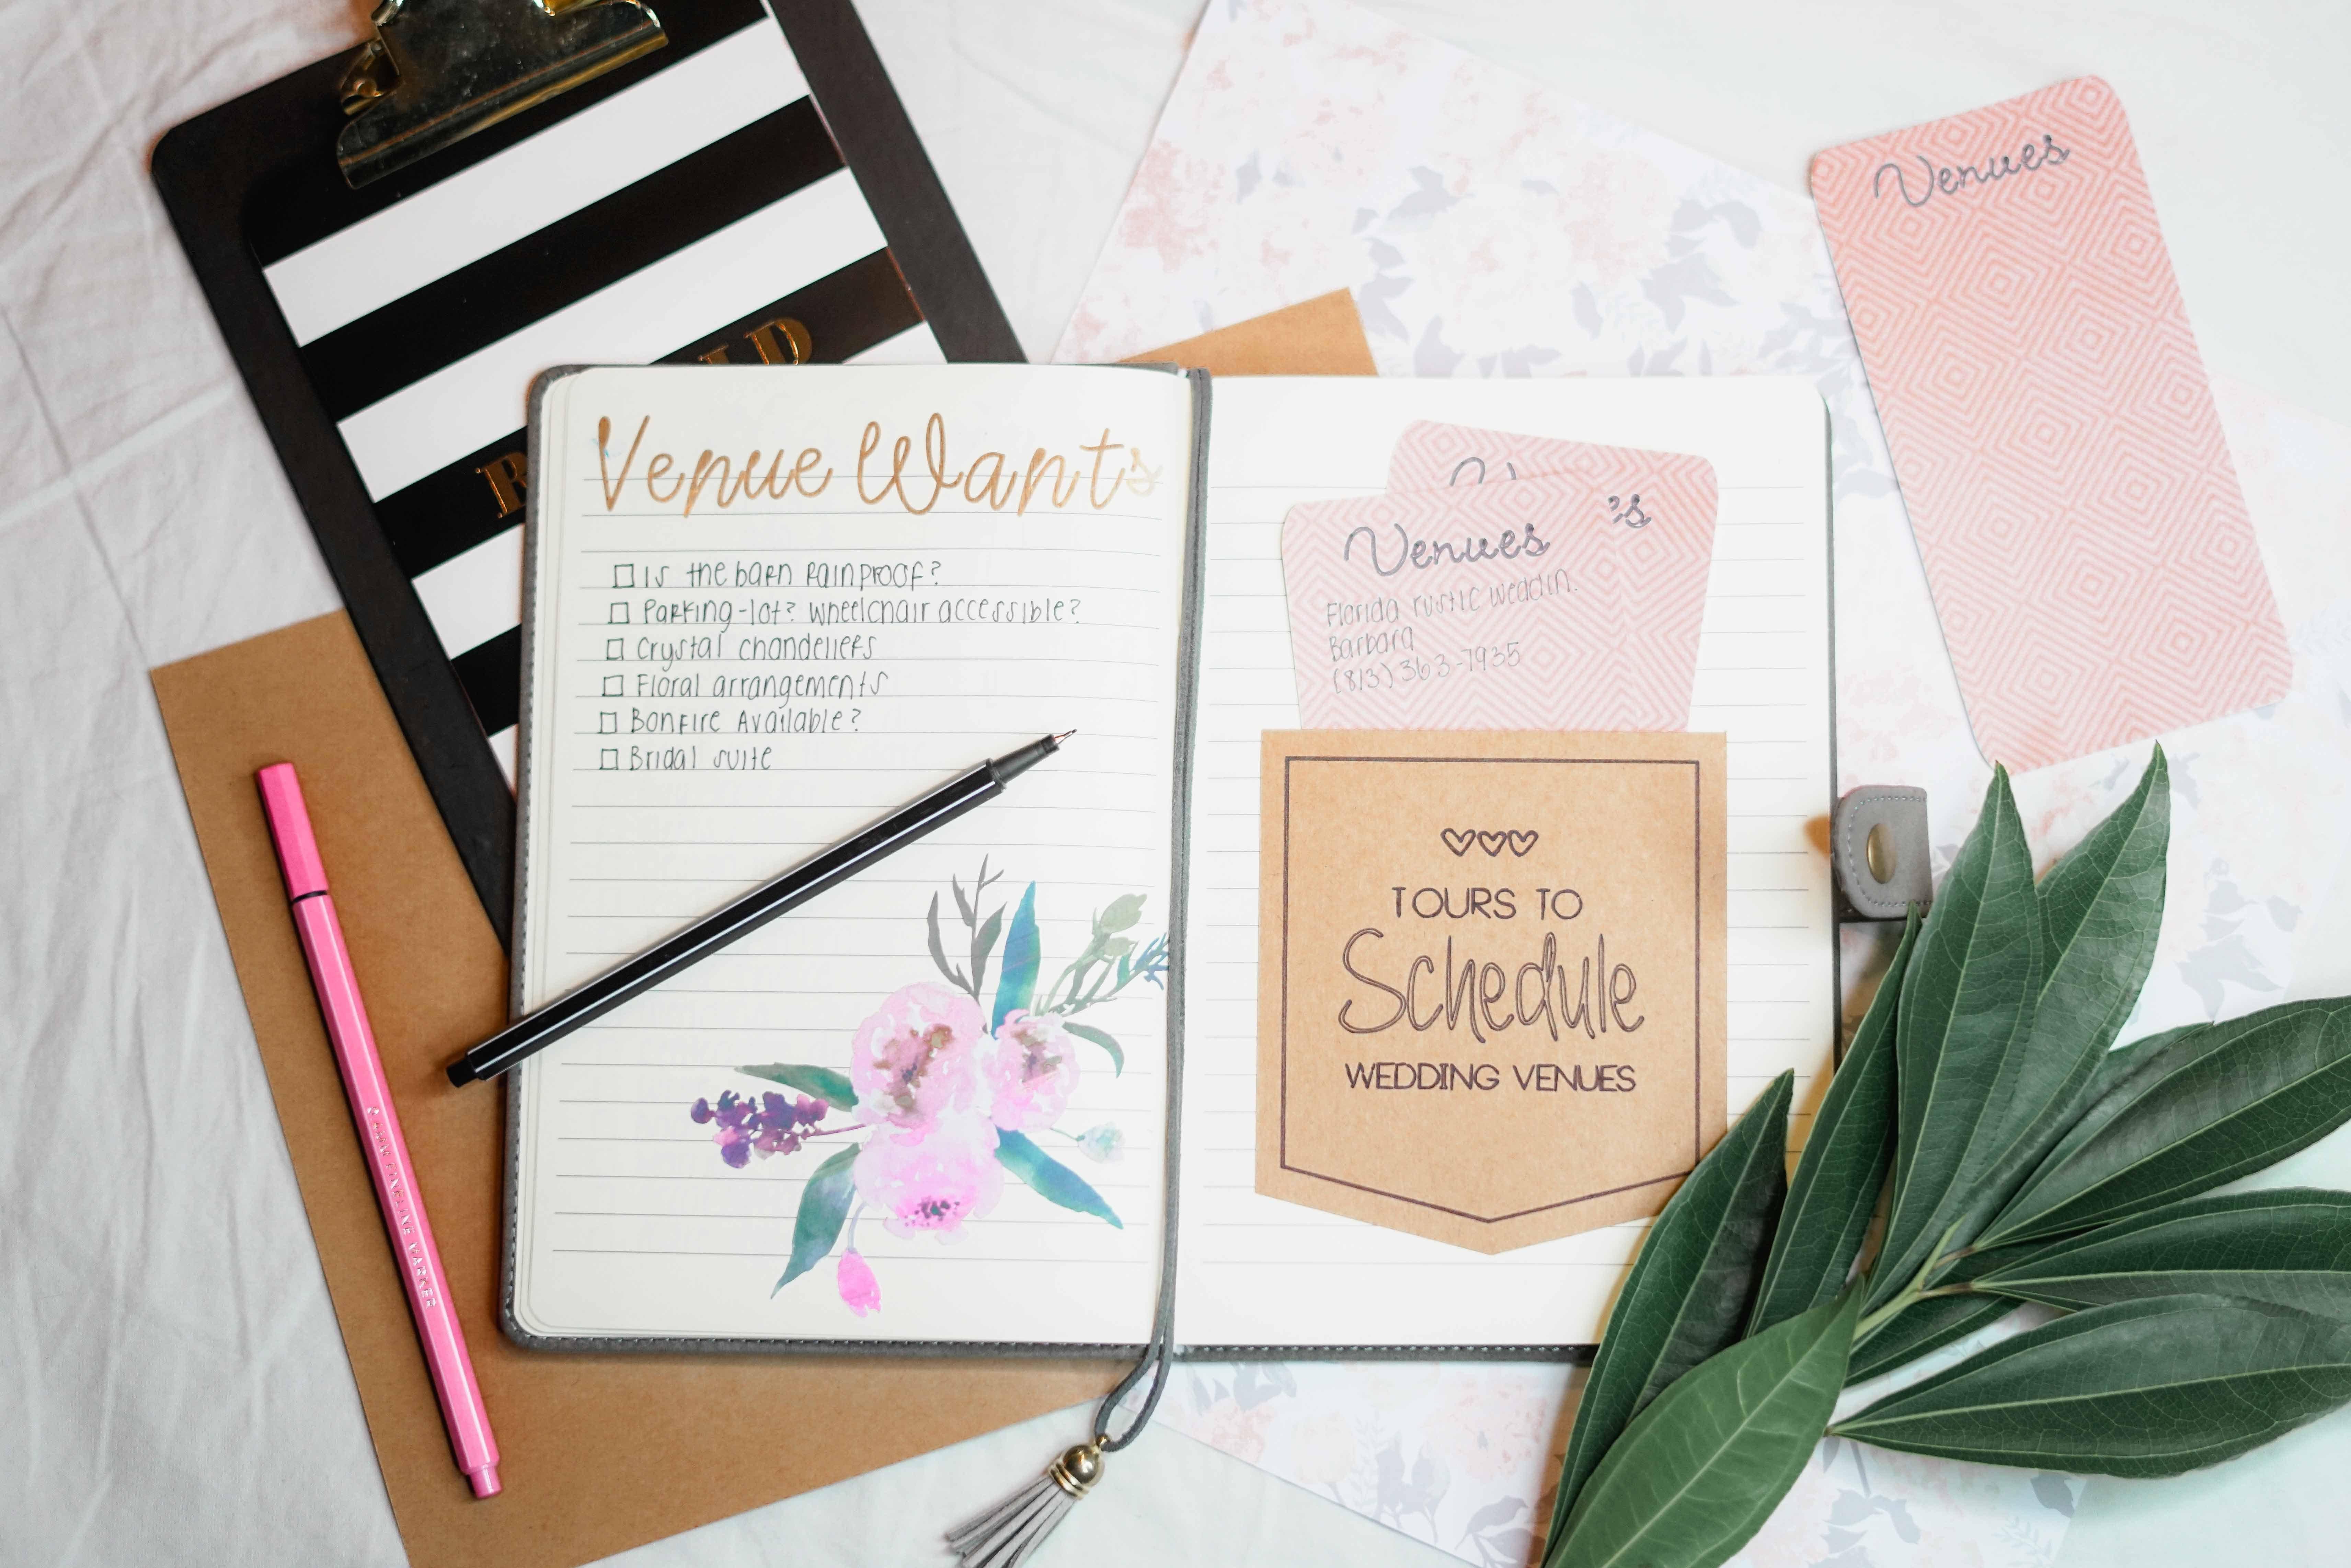 Schedule Your Wedding